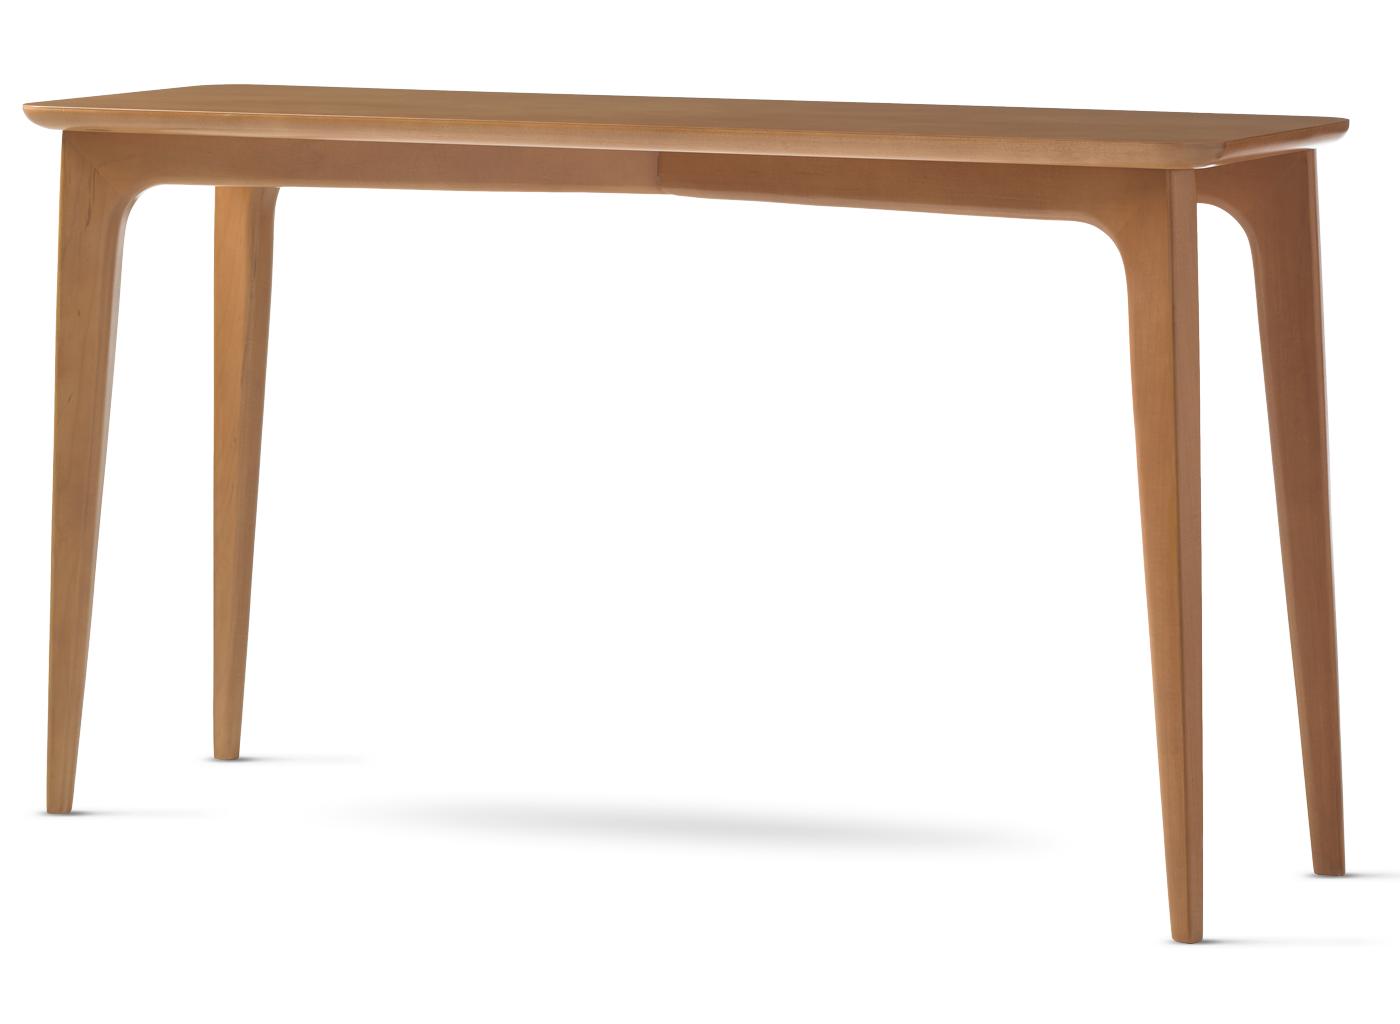 Hayden Table 2350 90 1400X1024px 150dpi